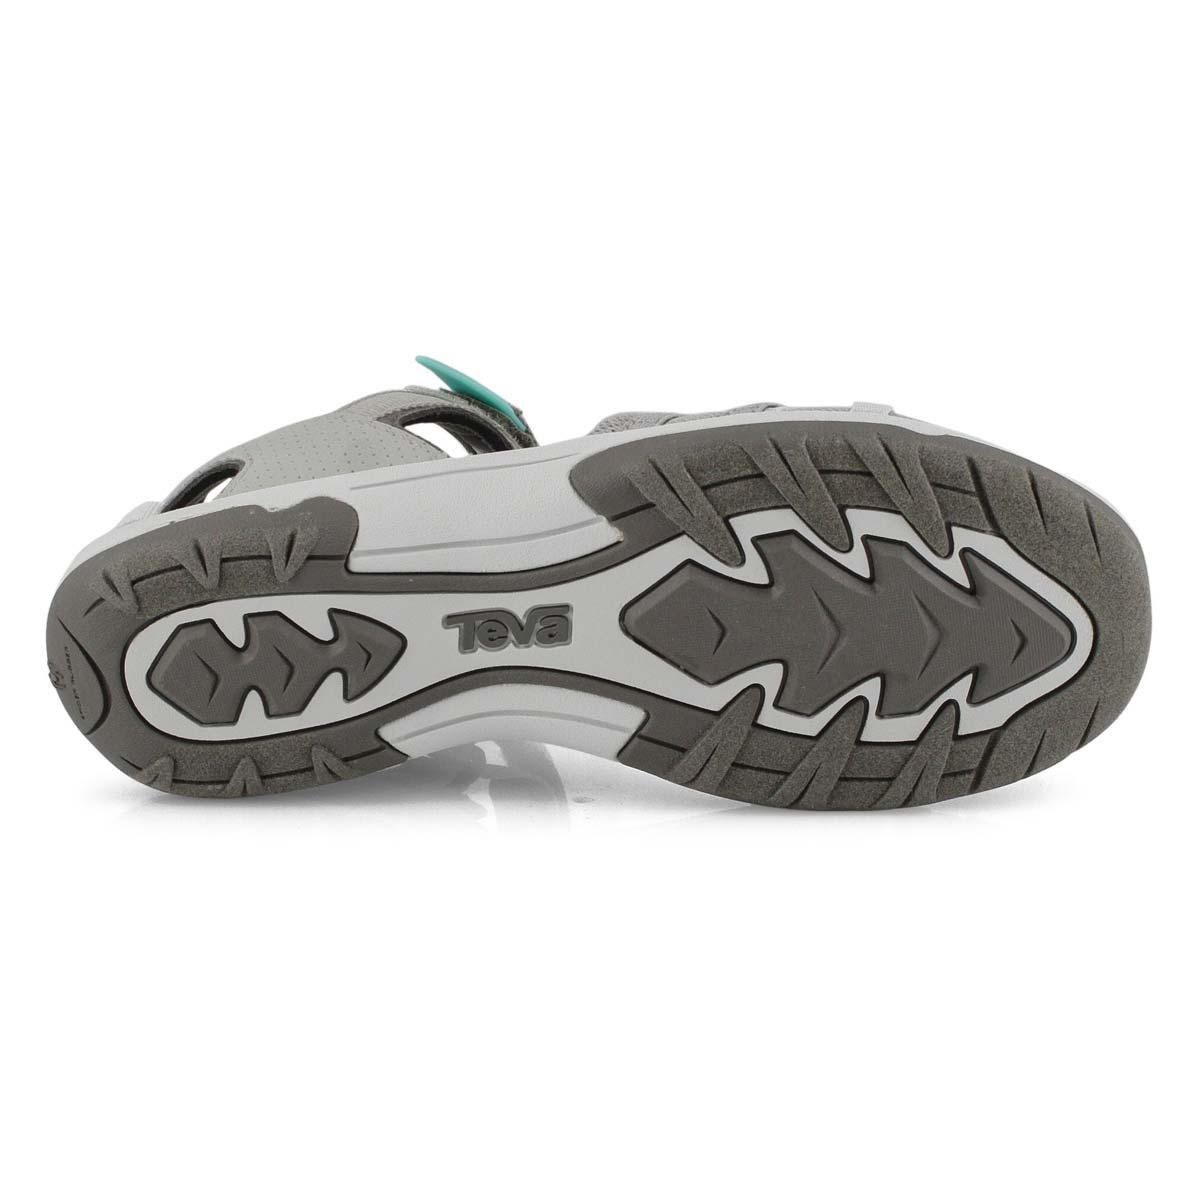 Lds Tirra CT drizzle sport sandal